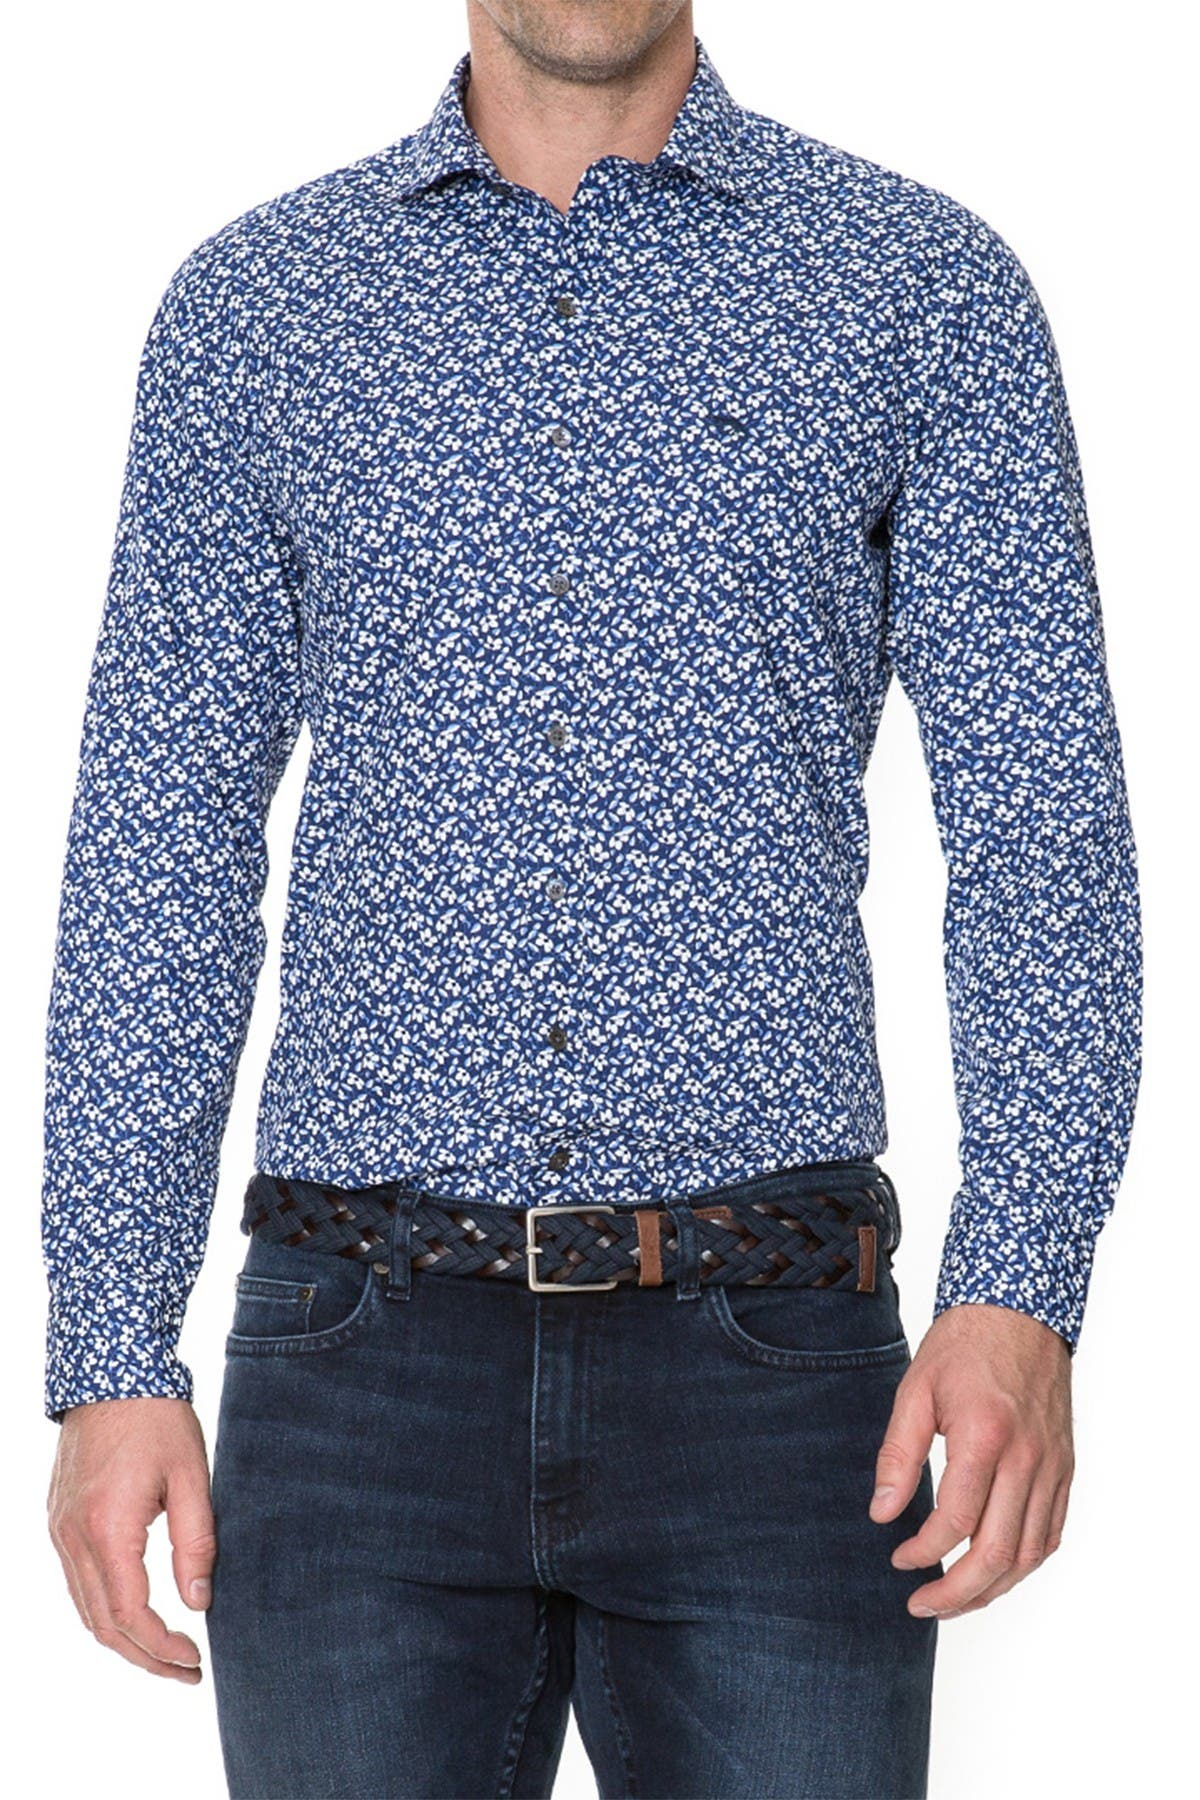 Image of RODD AND GUNN Riverside Long Sleeve Shirt